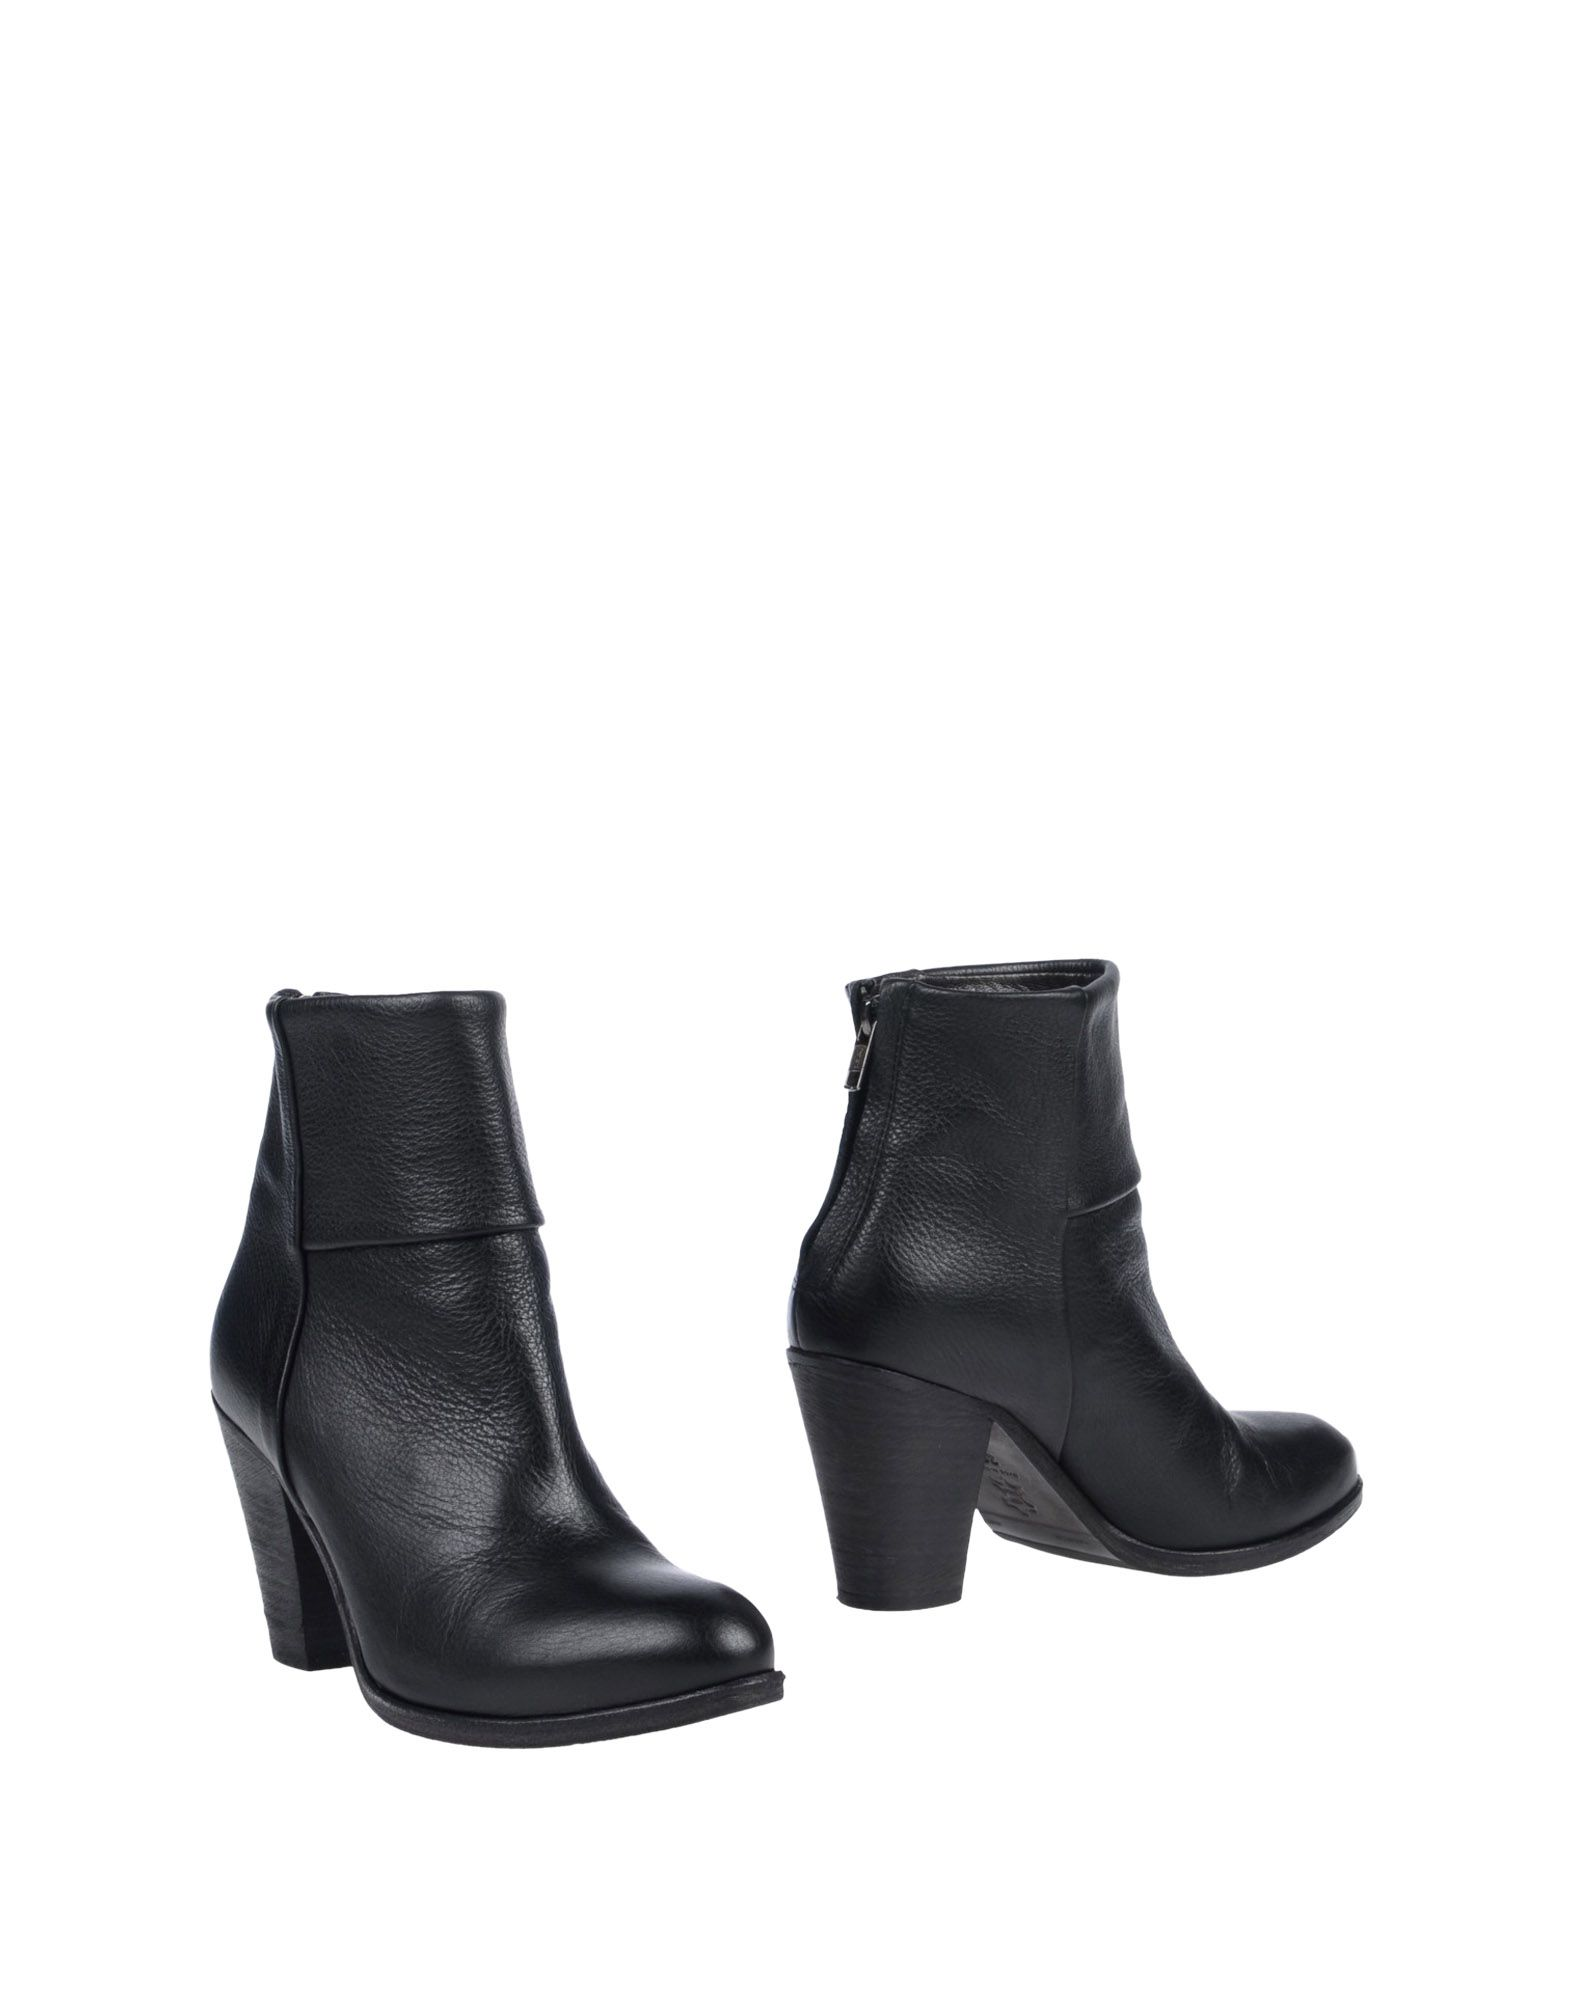 Via Roma 15 Stiefelette Damen  11430810AL Gute Qualität beliebte Schuhe